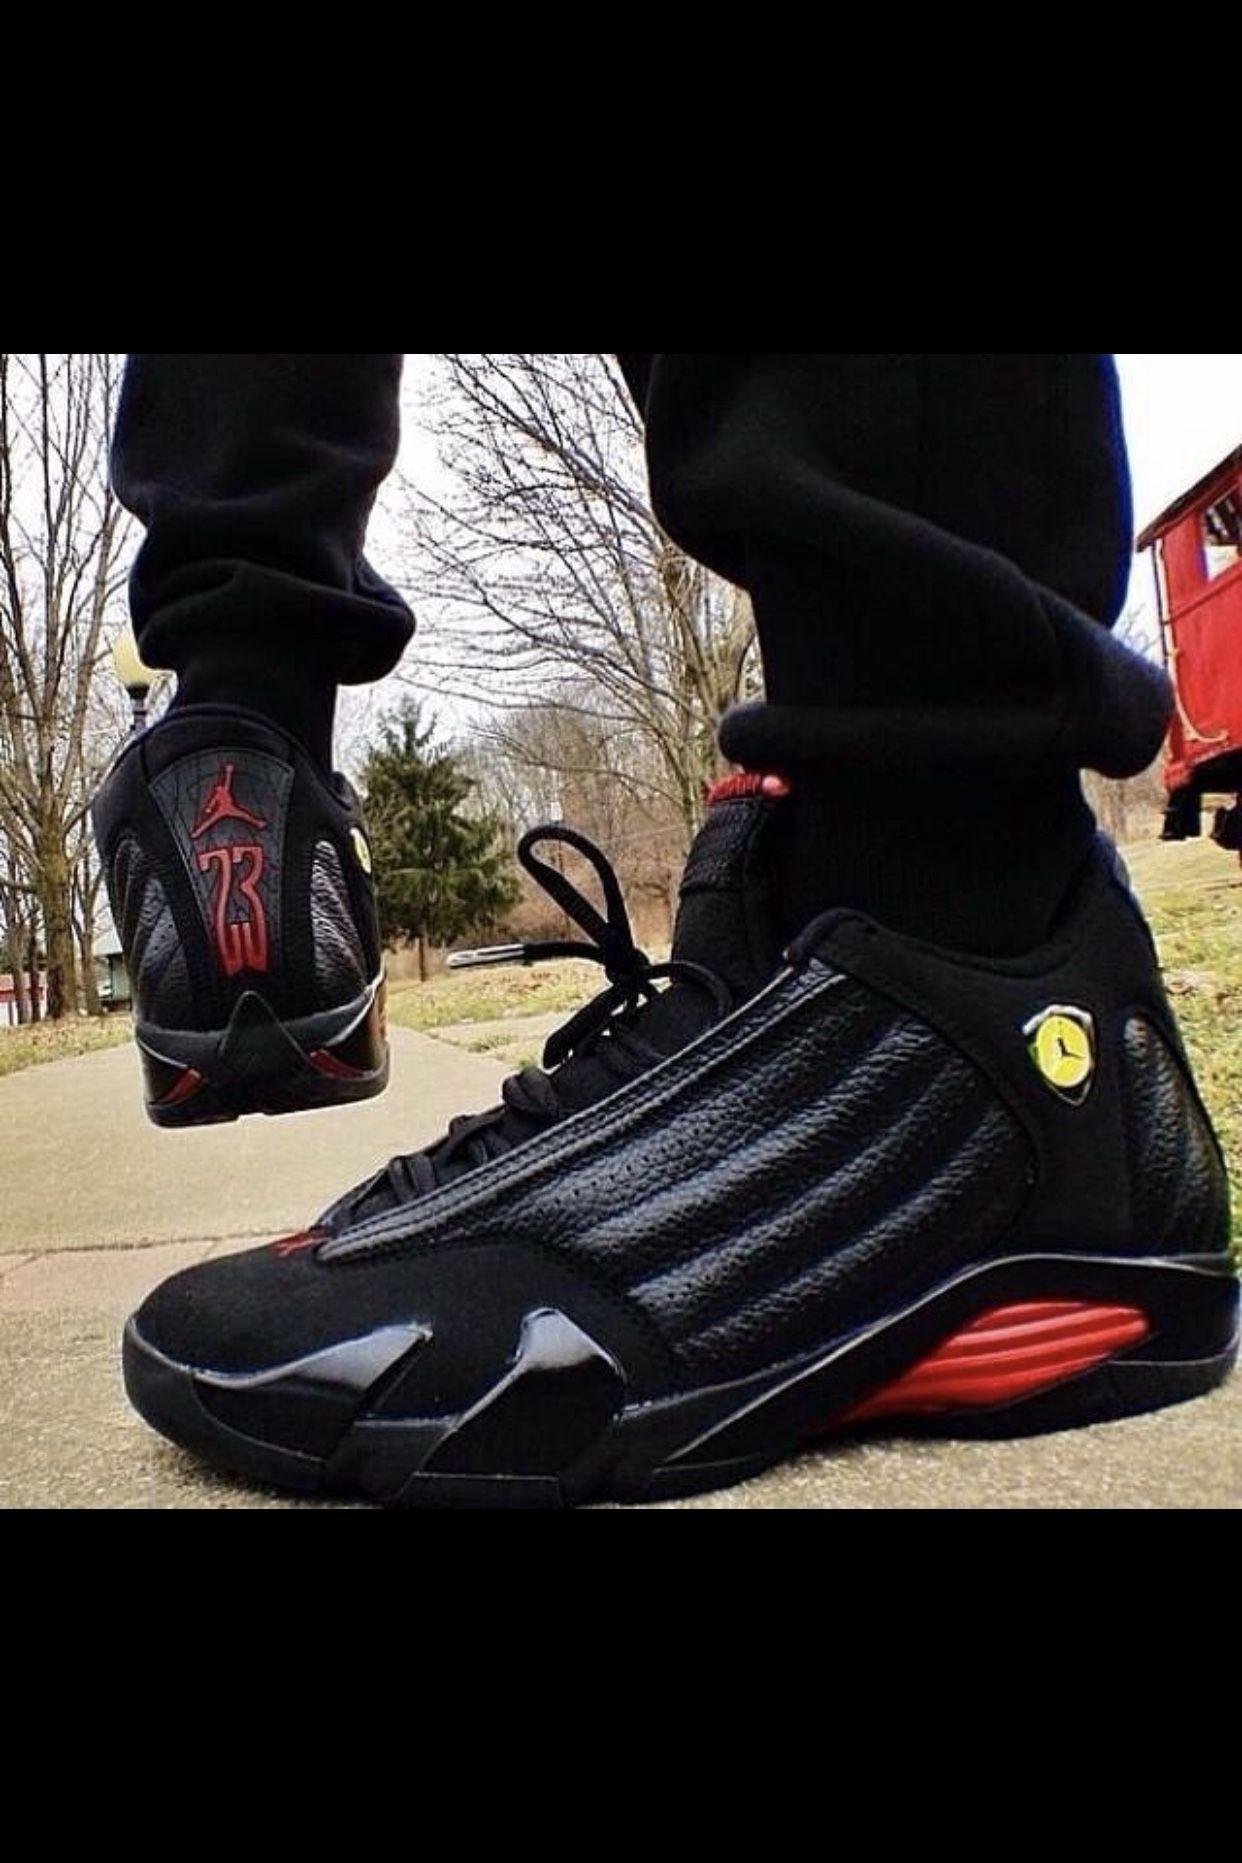 54b366d071ecde Men s Jordan Retro 14 - Black